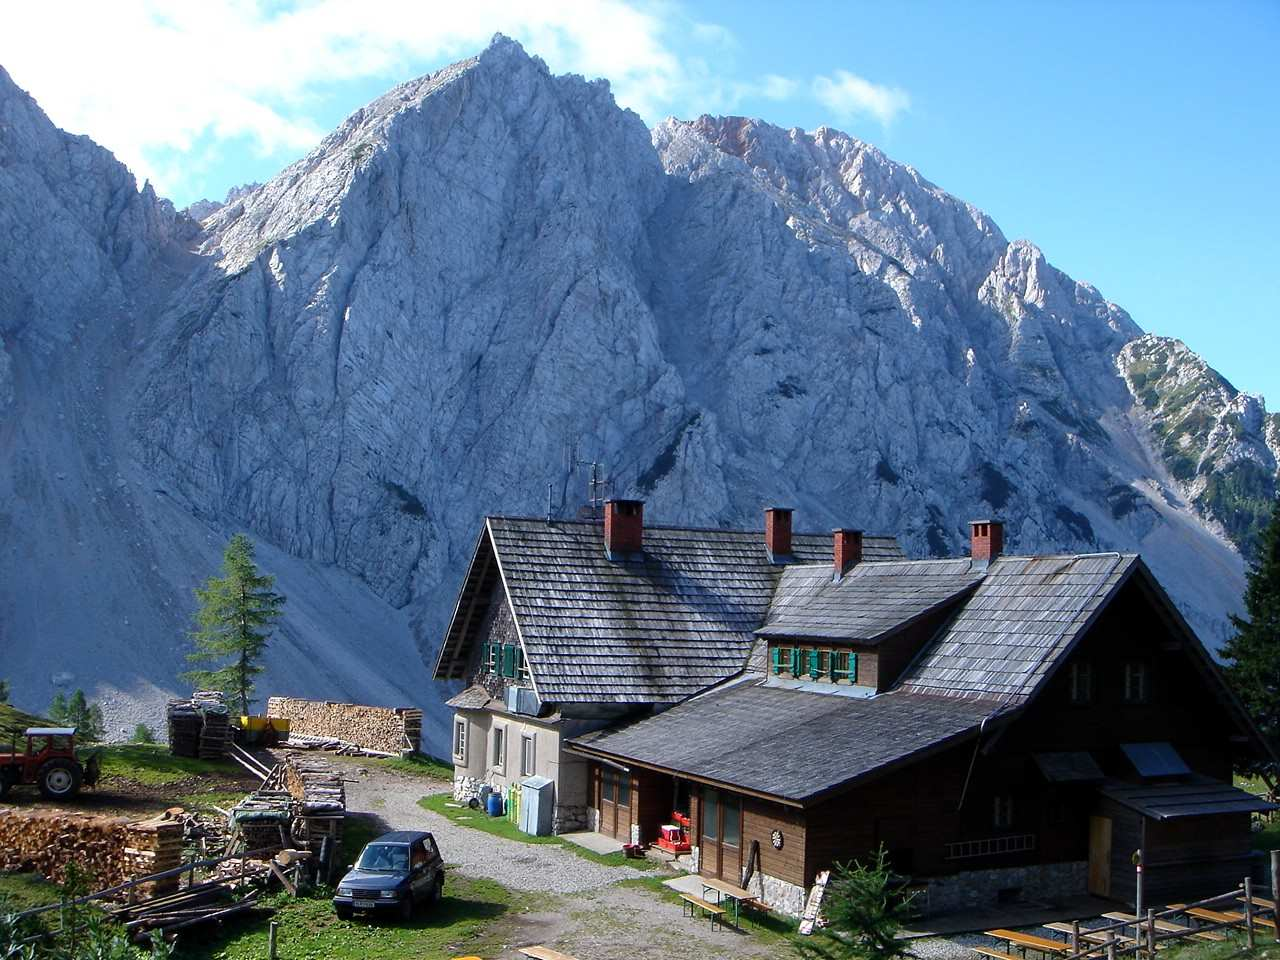 Foto: Manfred Karl / Wander Tour / Über die Klagenfurter Hütte auf den Geißberg / Klagenfurter Hütte / 20.06.2007 18:10:31